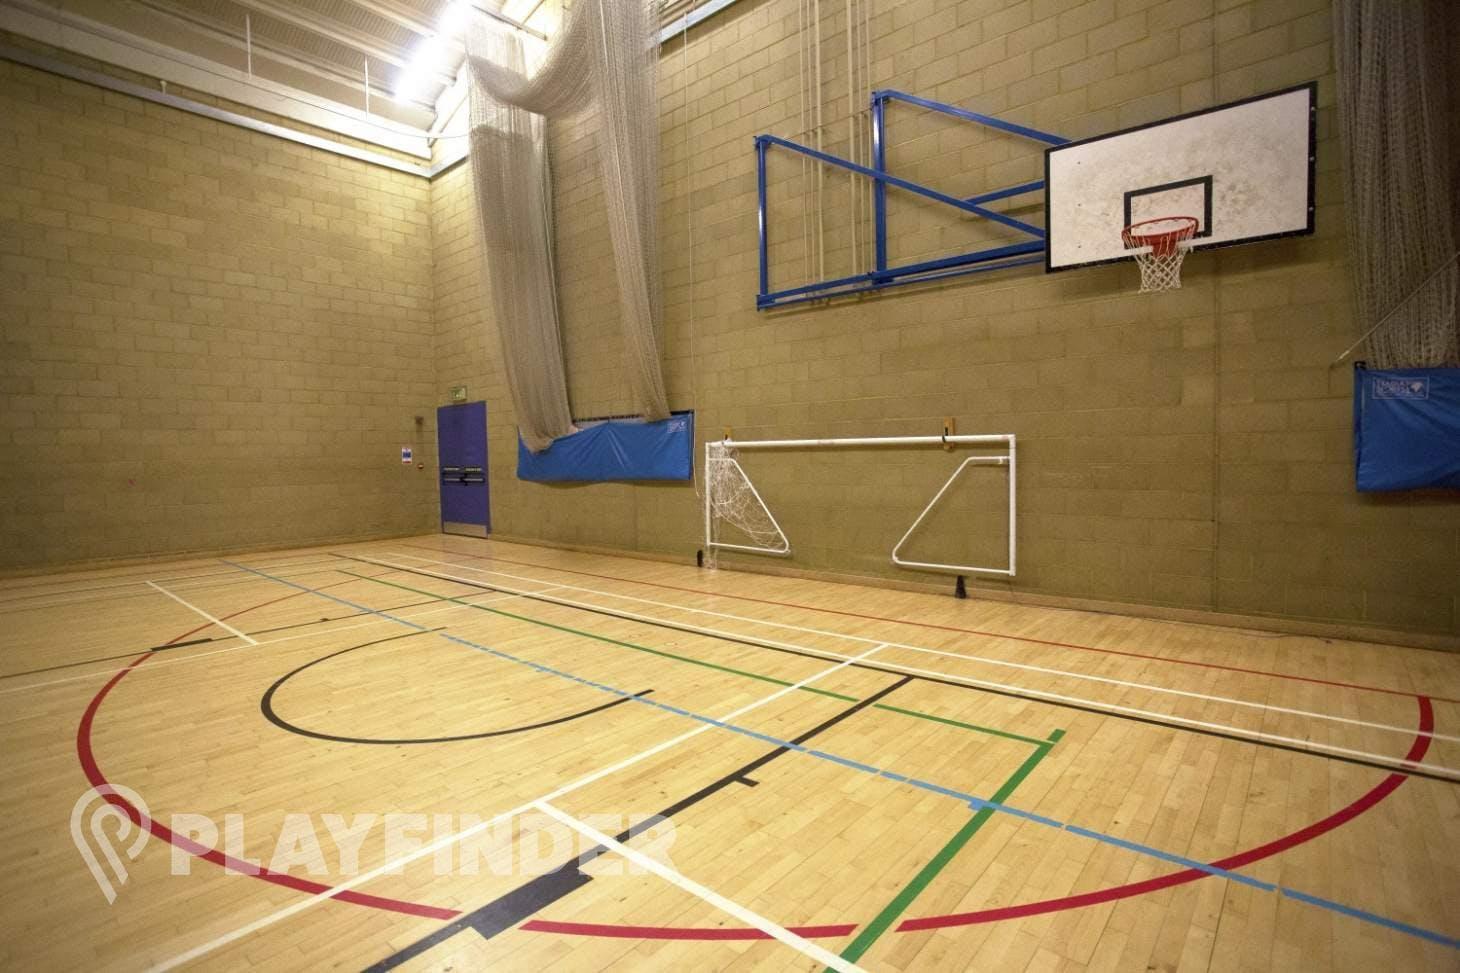 Royal Holloway University Sports Centre Indoor netball court